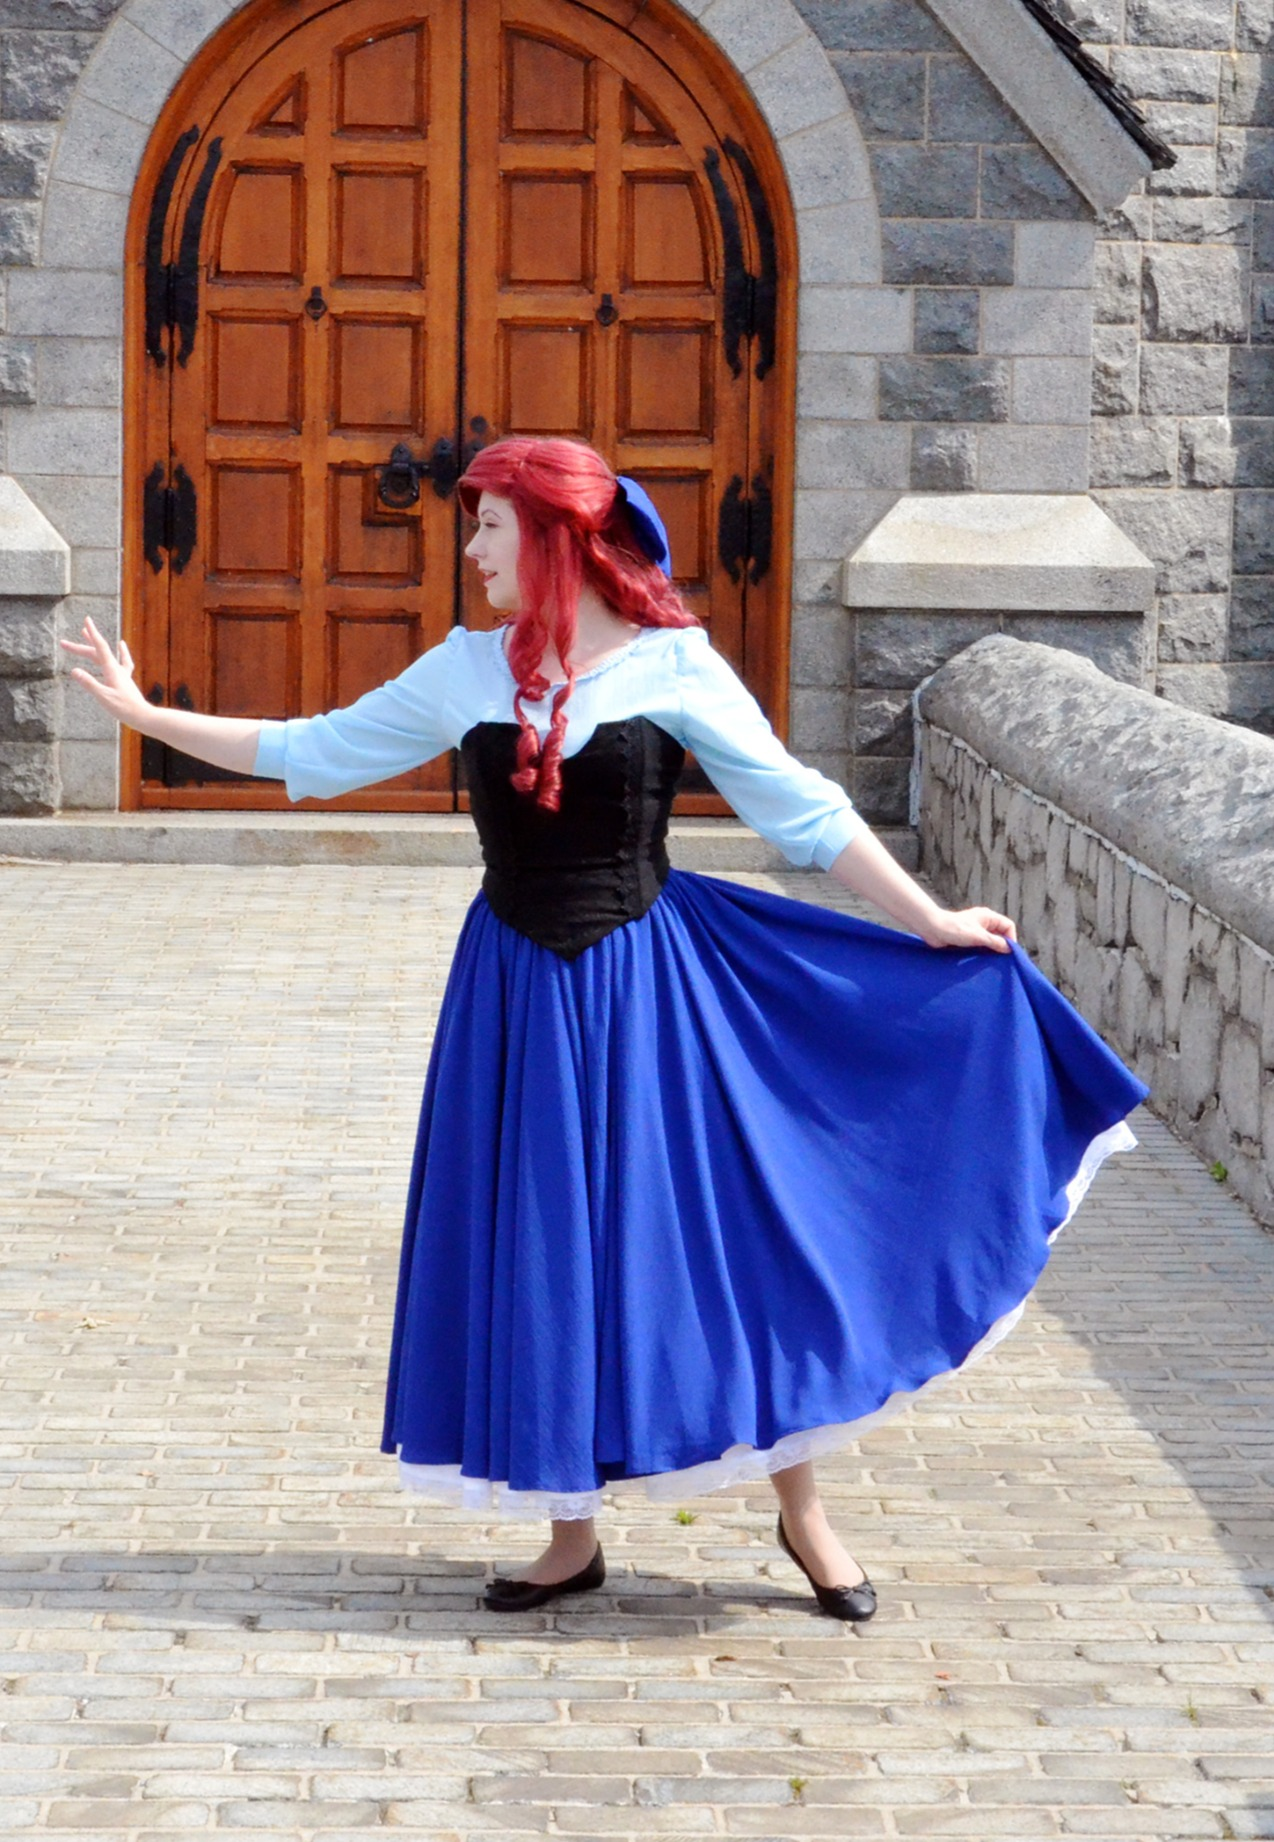 Mermaid Princess (town)